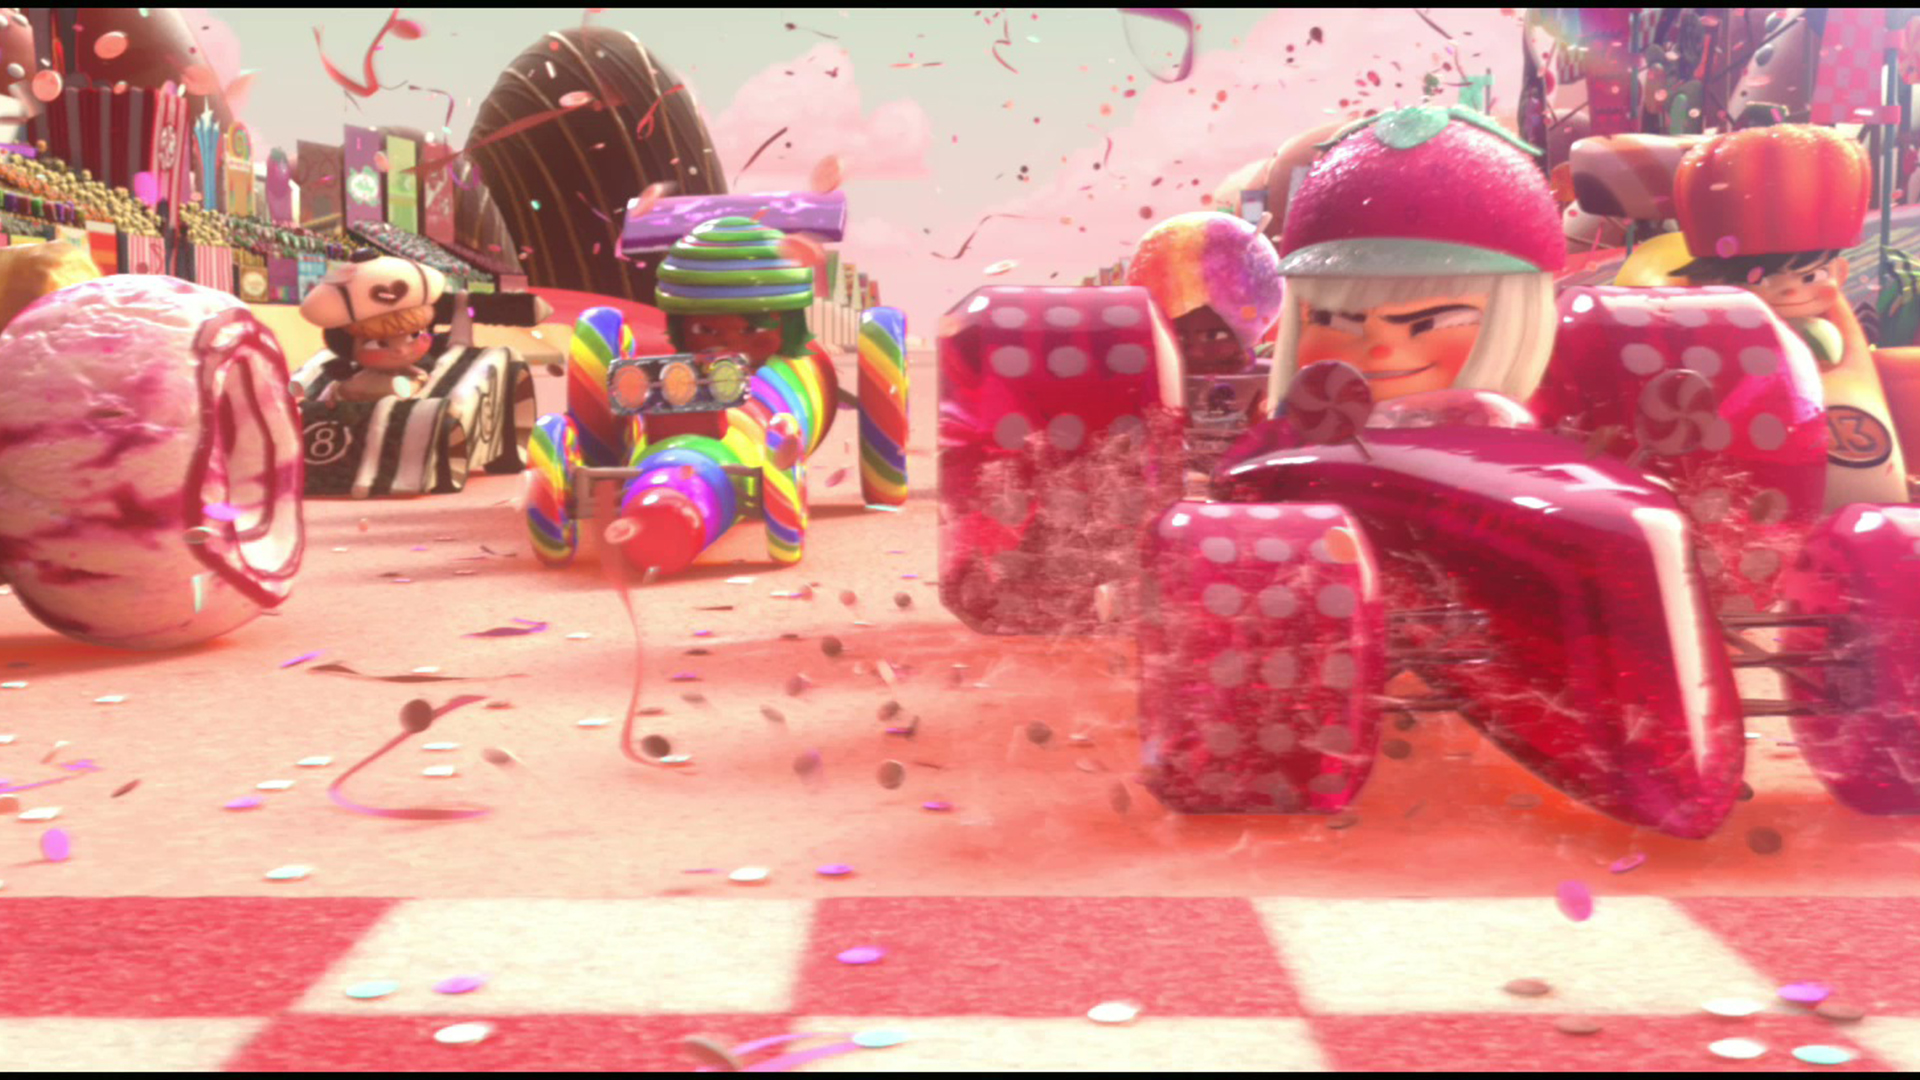 Wreck It Ralph Animation Movie 4k Hd Desktop Wallpaper For: Free Desktop Wallpapers For Widescreen